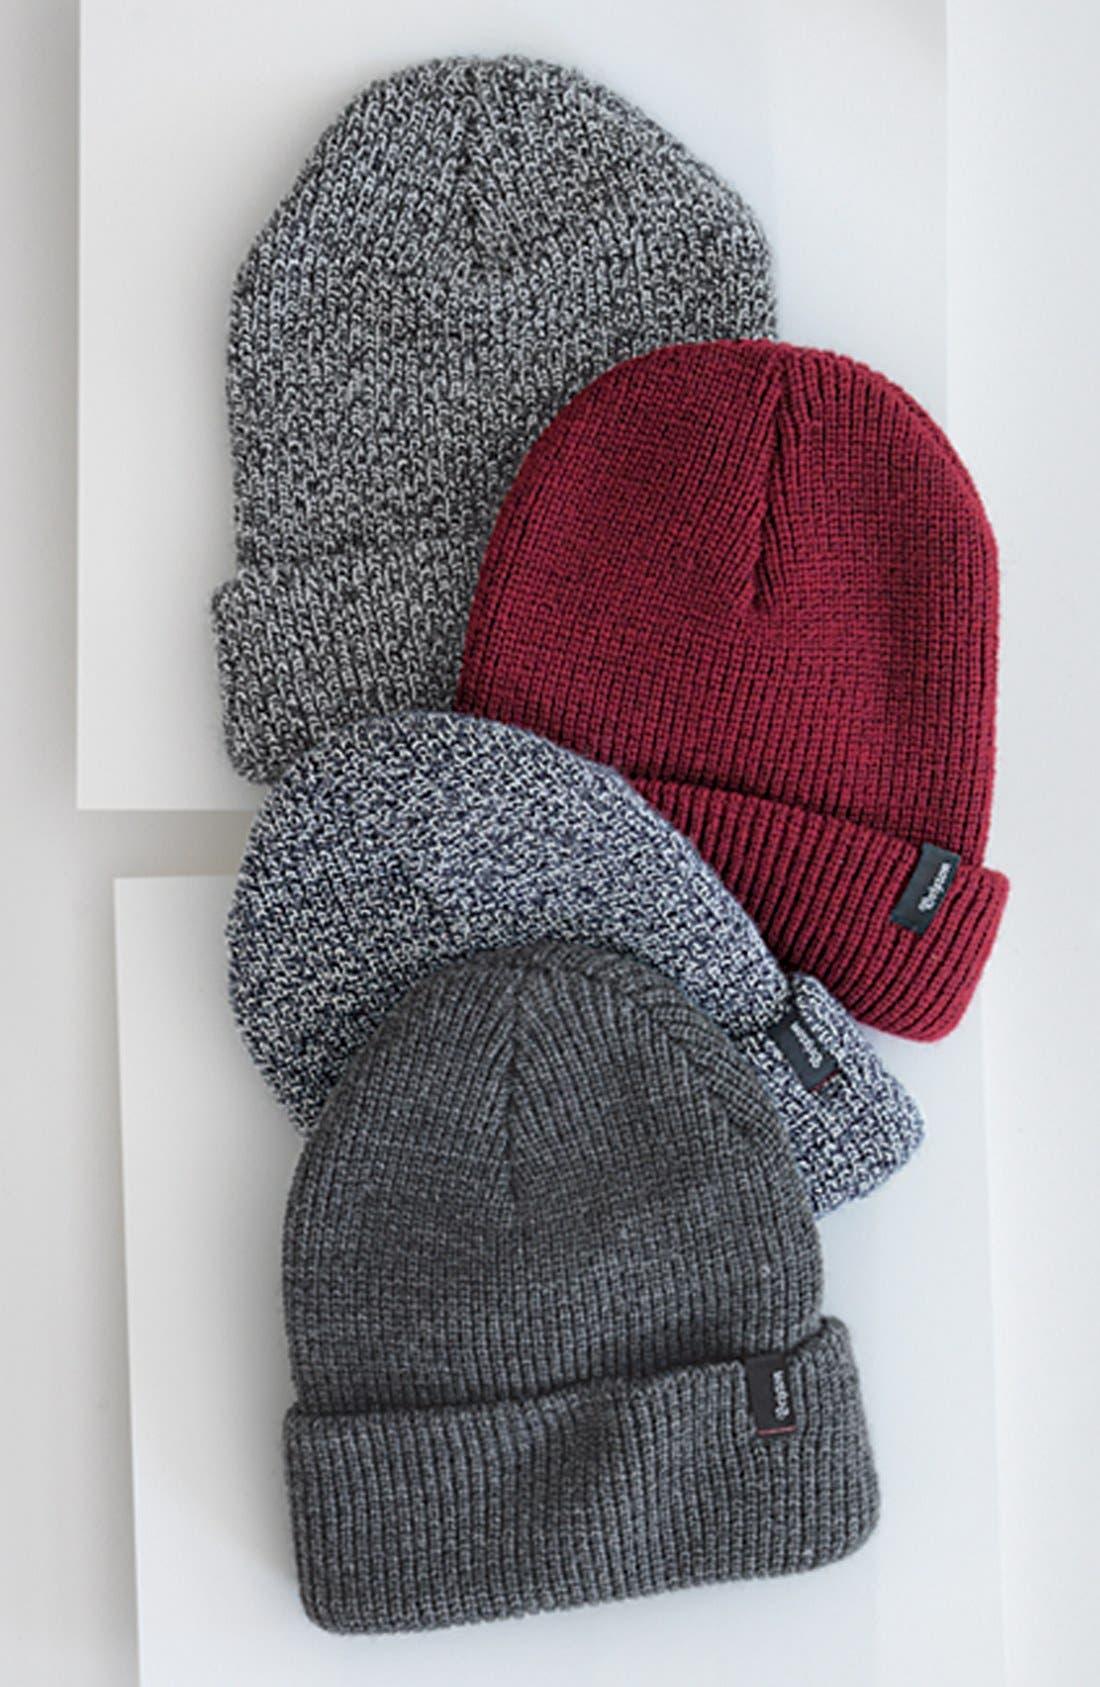 'Heist' Rib Knit Cap,                             Alternate thumbnail 12, color,